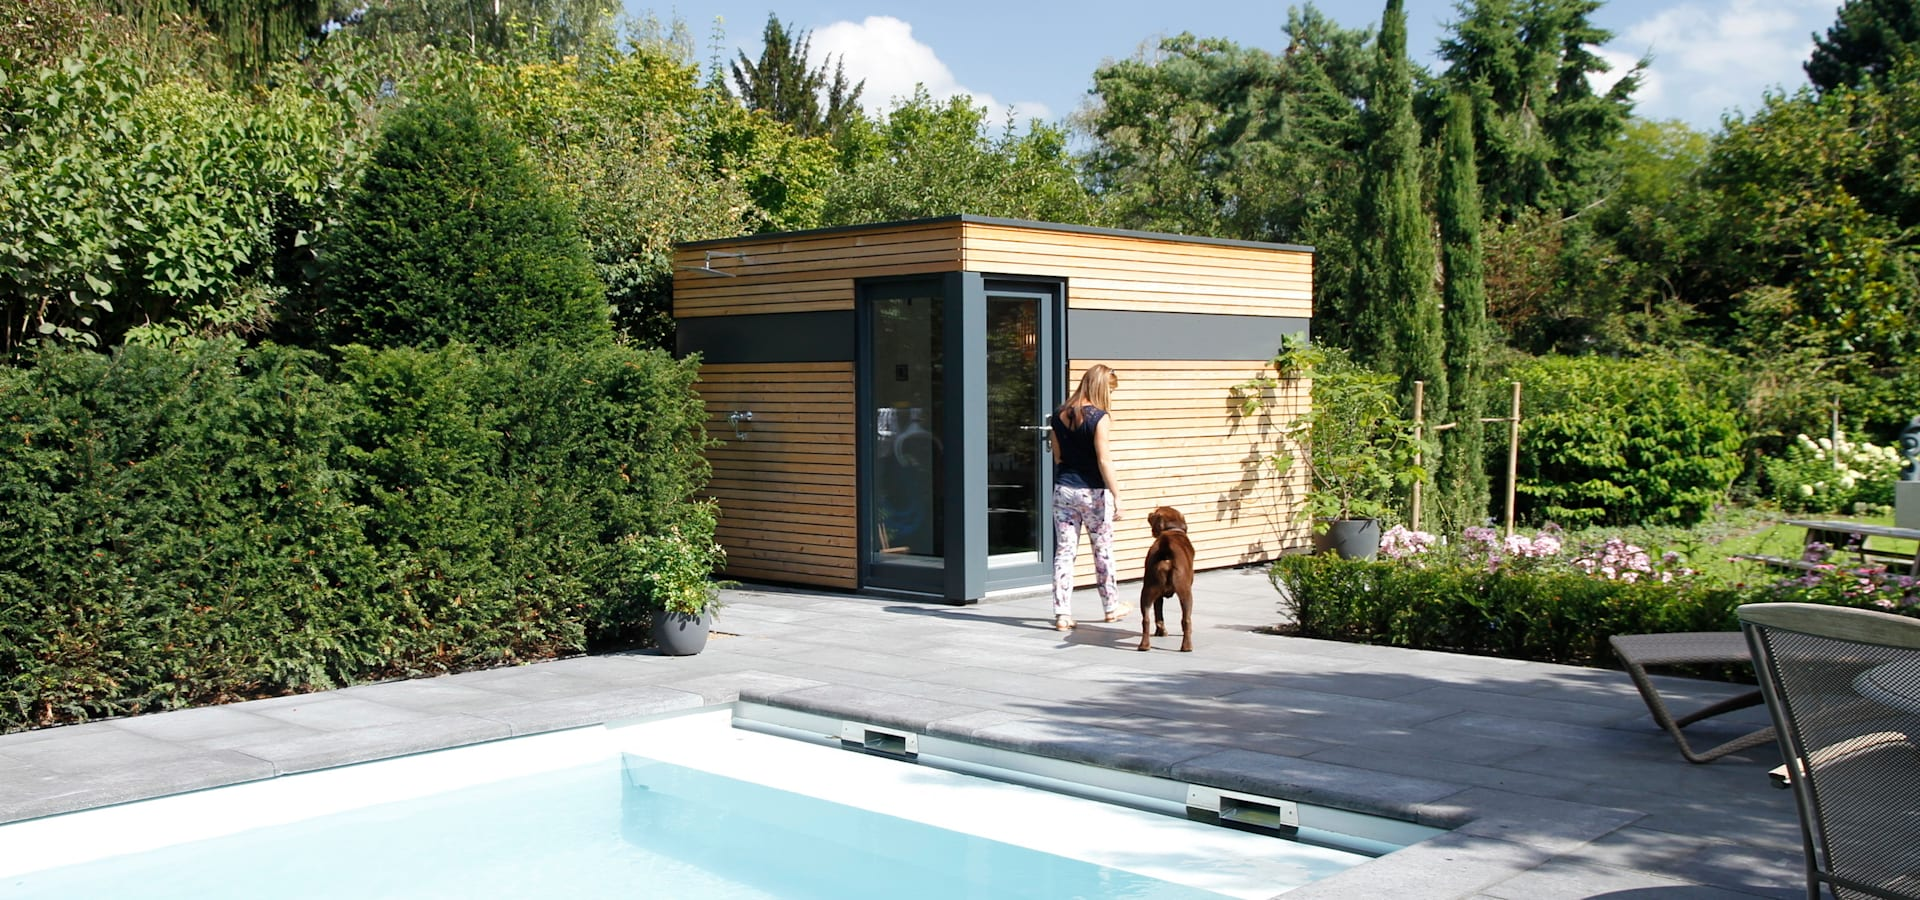 gartenhauptdarsteller - Moderne Gartenhuser